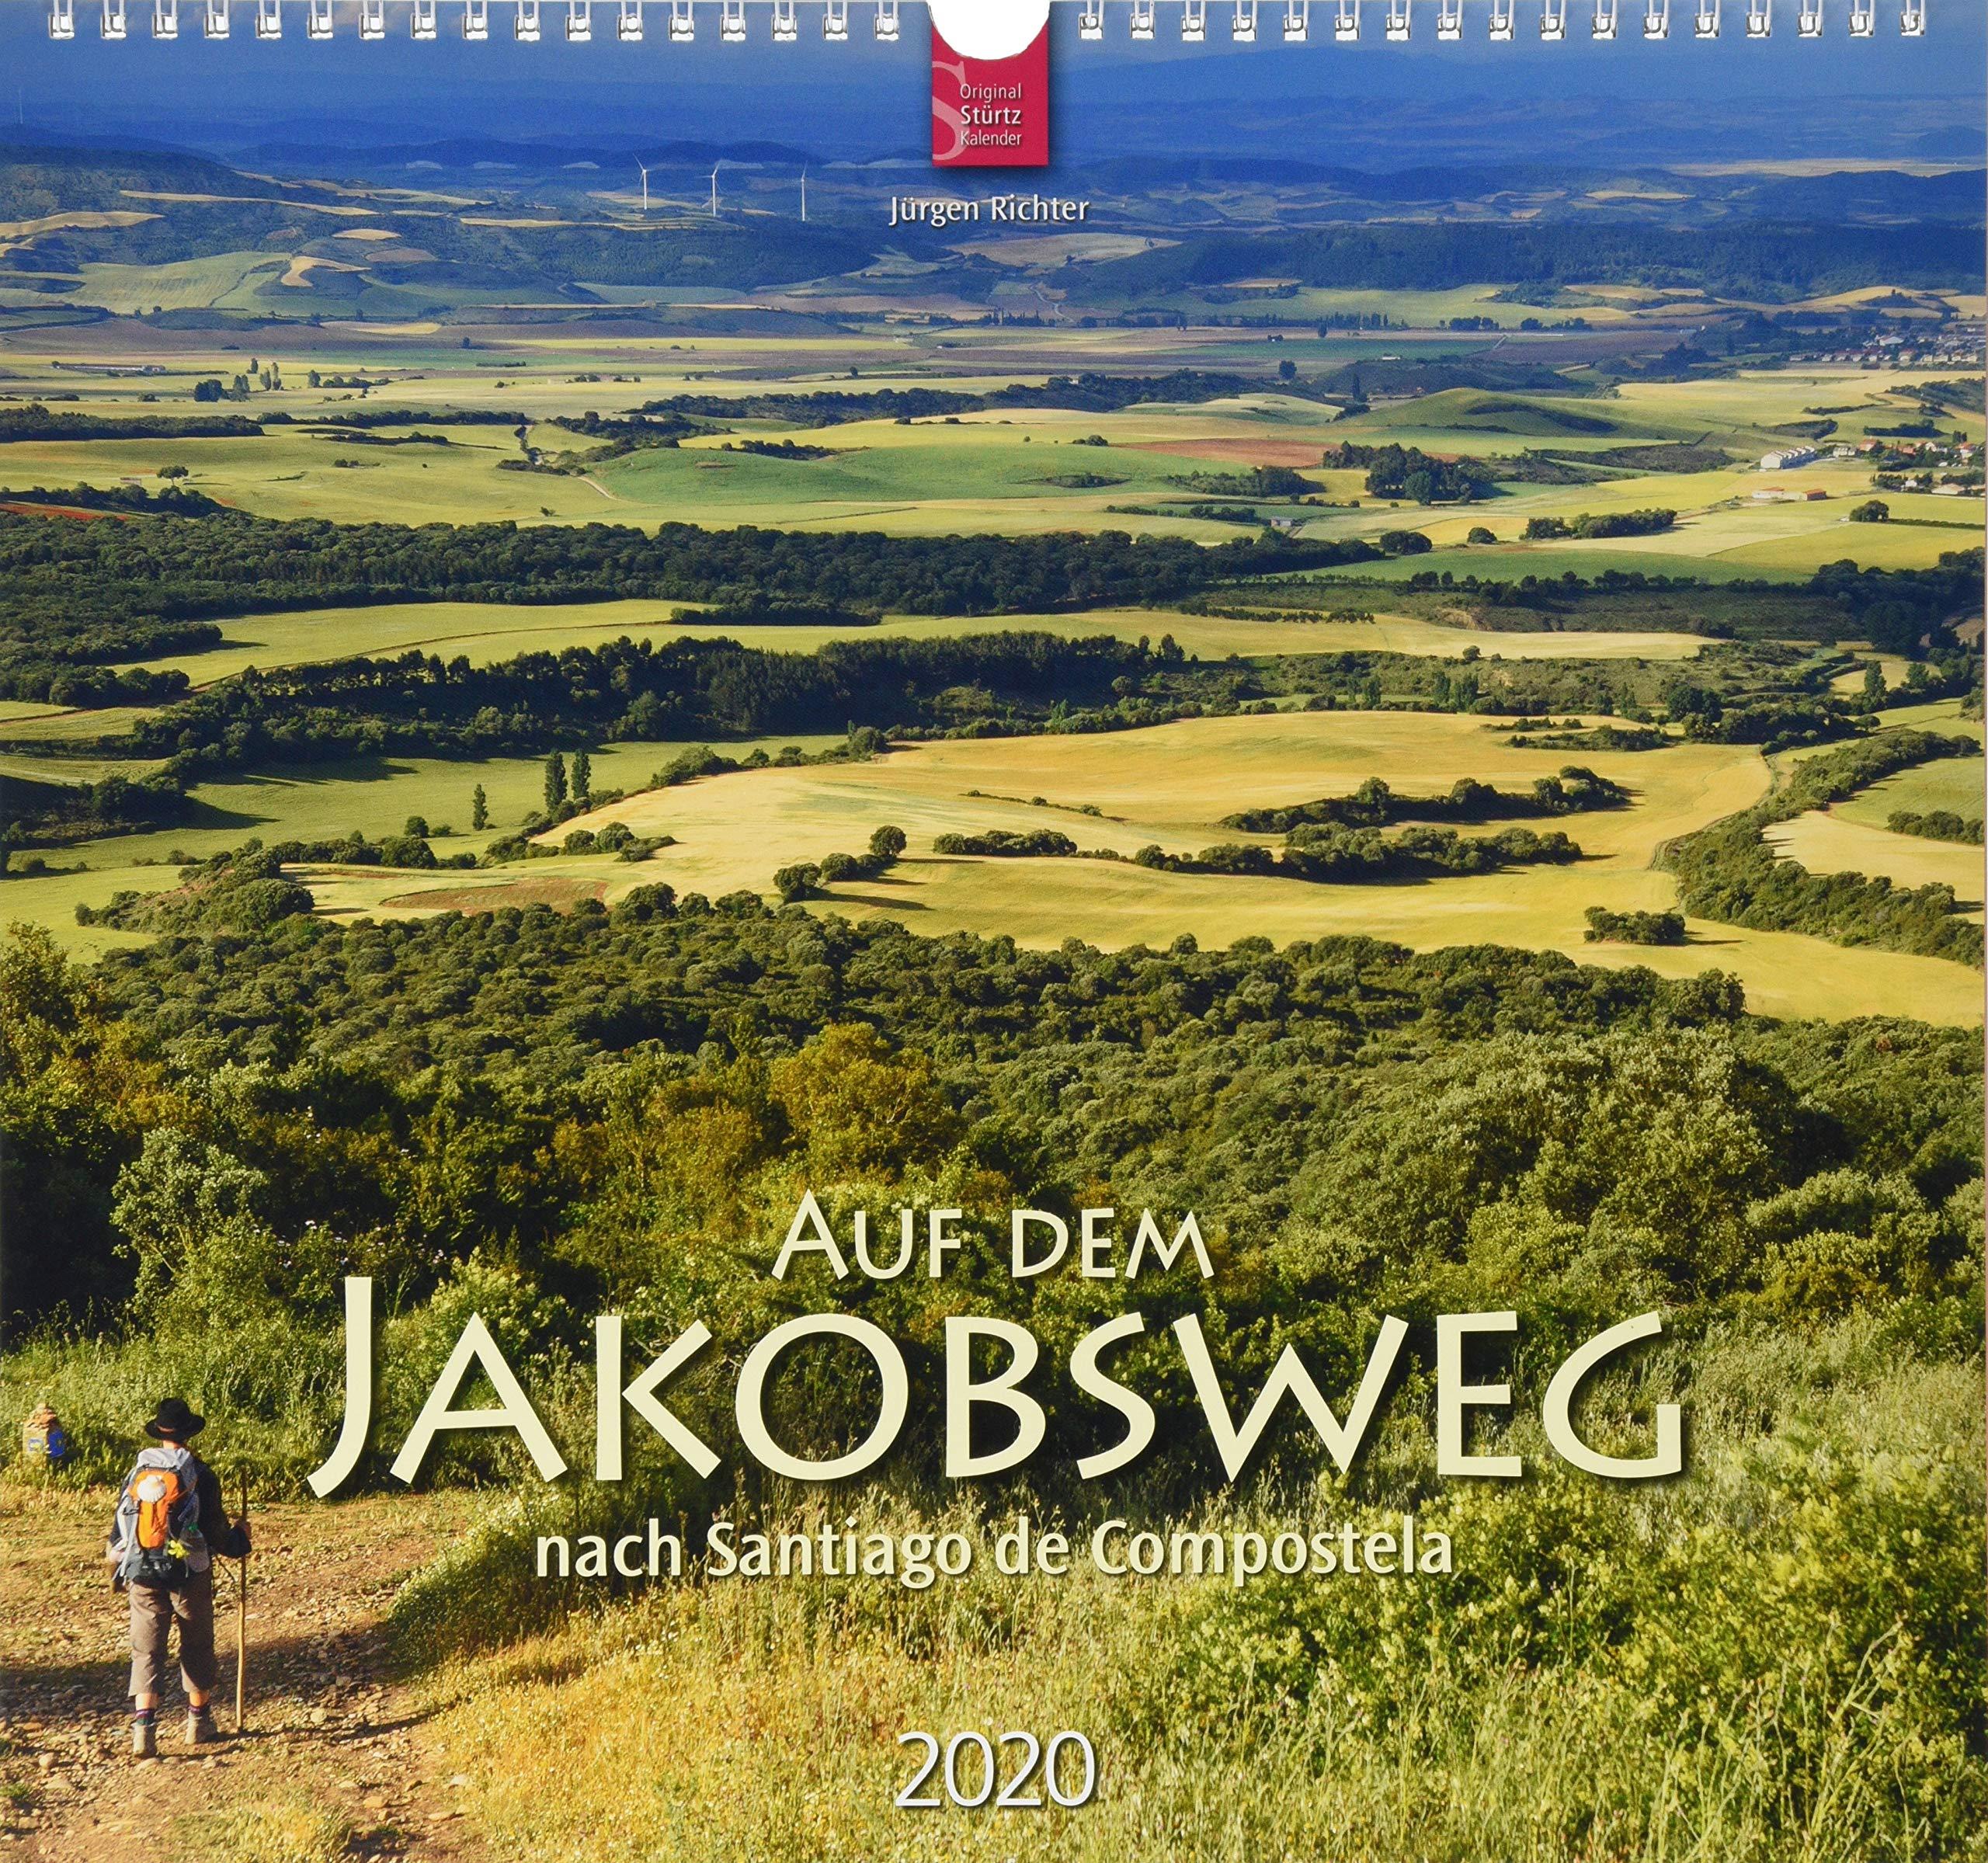 Auf Dem Jakobsweg Nach Santiago De Compostela  Original Stürtz Kalender 2020   Mittelformat Kalender 33 X 31 Cm